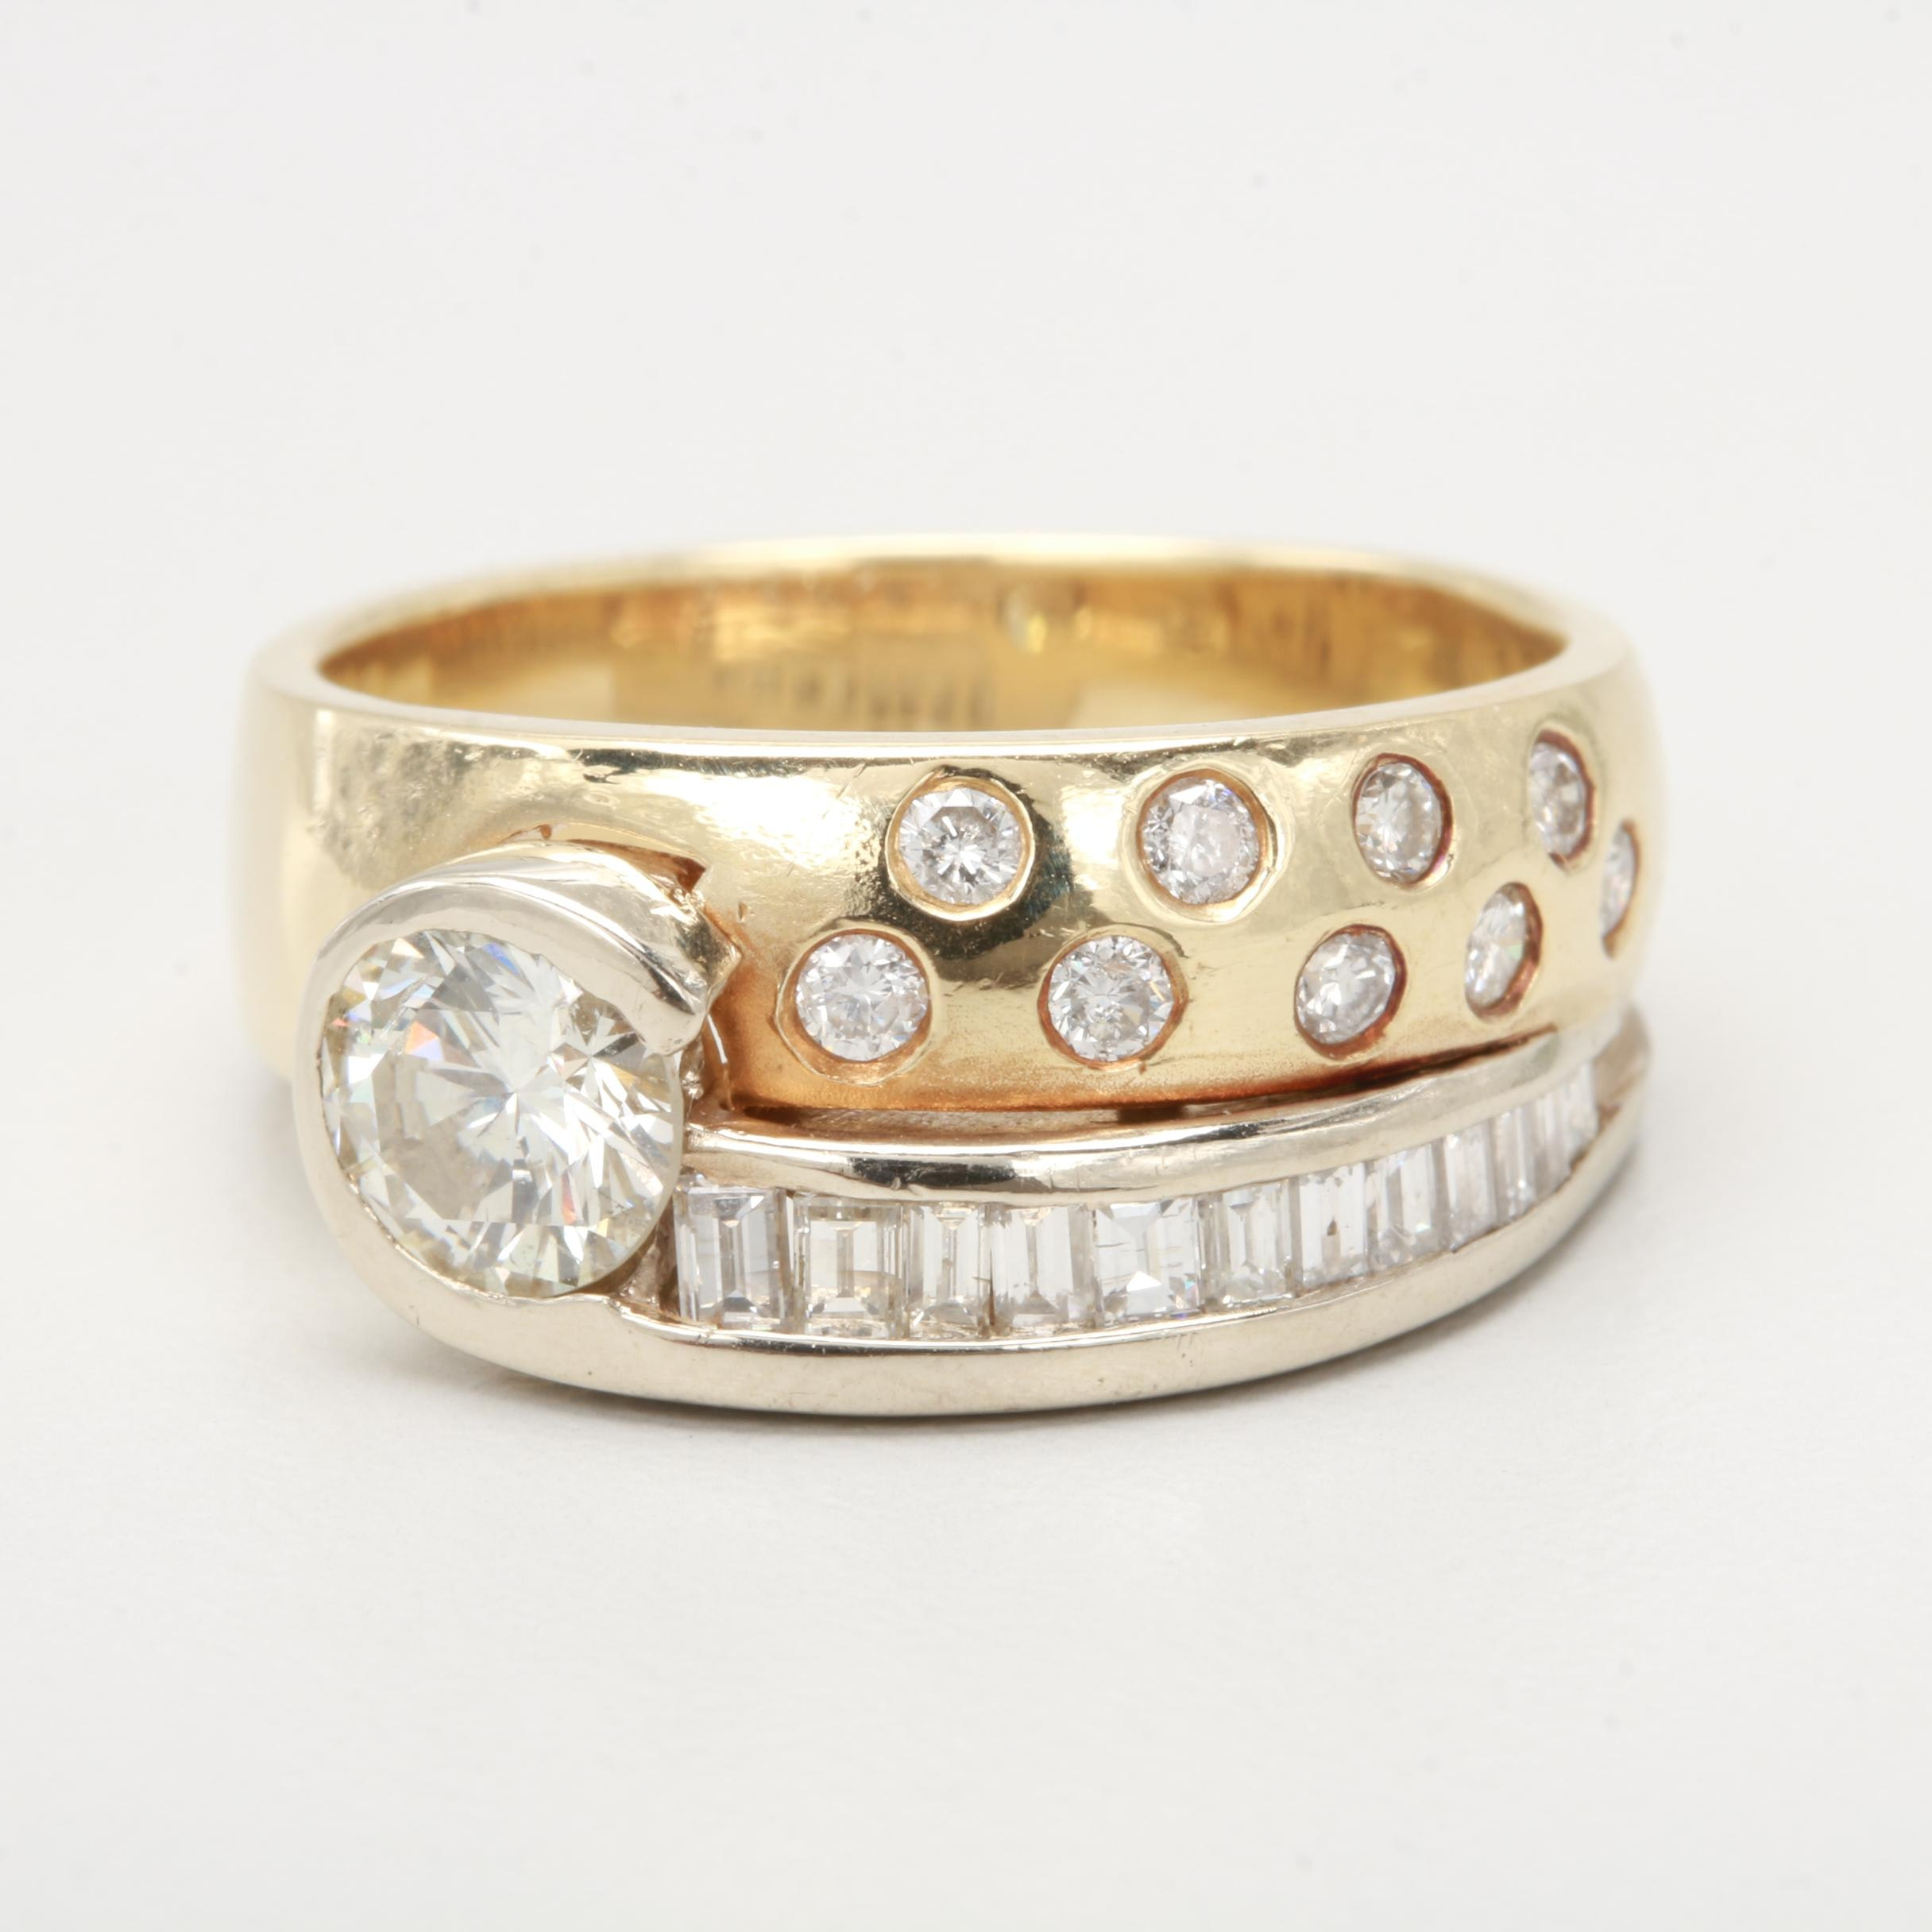 14K Yellow Gold 1.24 CTW Diamond Ring